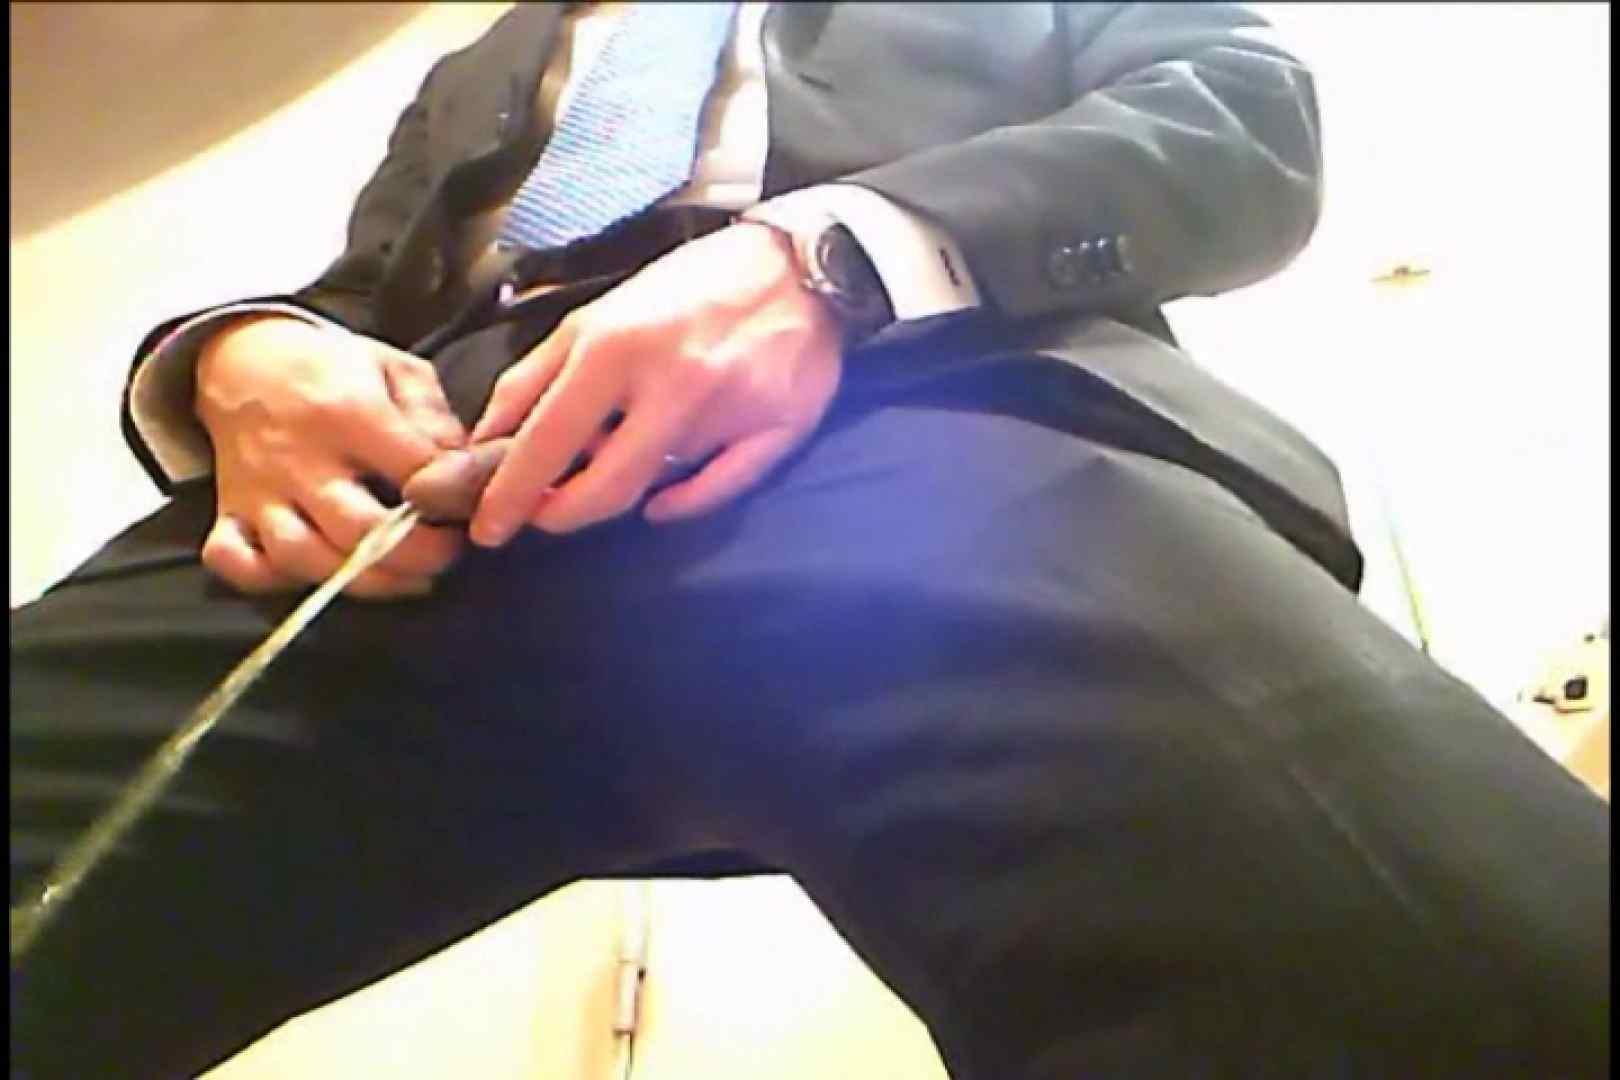 Gボーイ初投稿!掴み取りさんの洗面所覗き!in新幹線!VOL.05 覗きシーン ゲイエロ動画 96枚 28